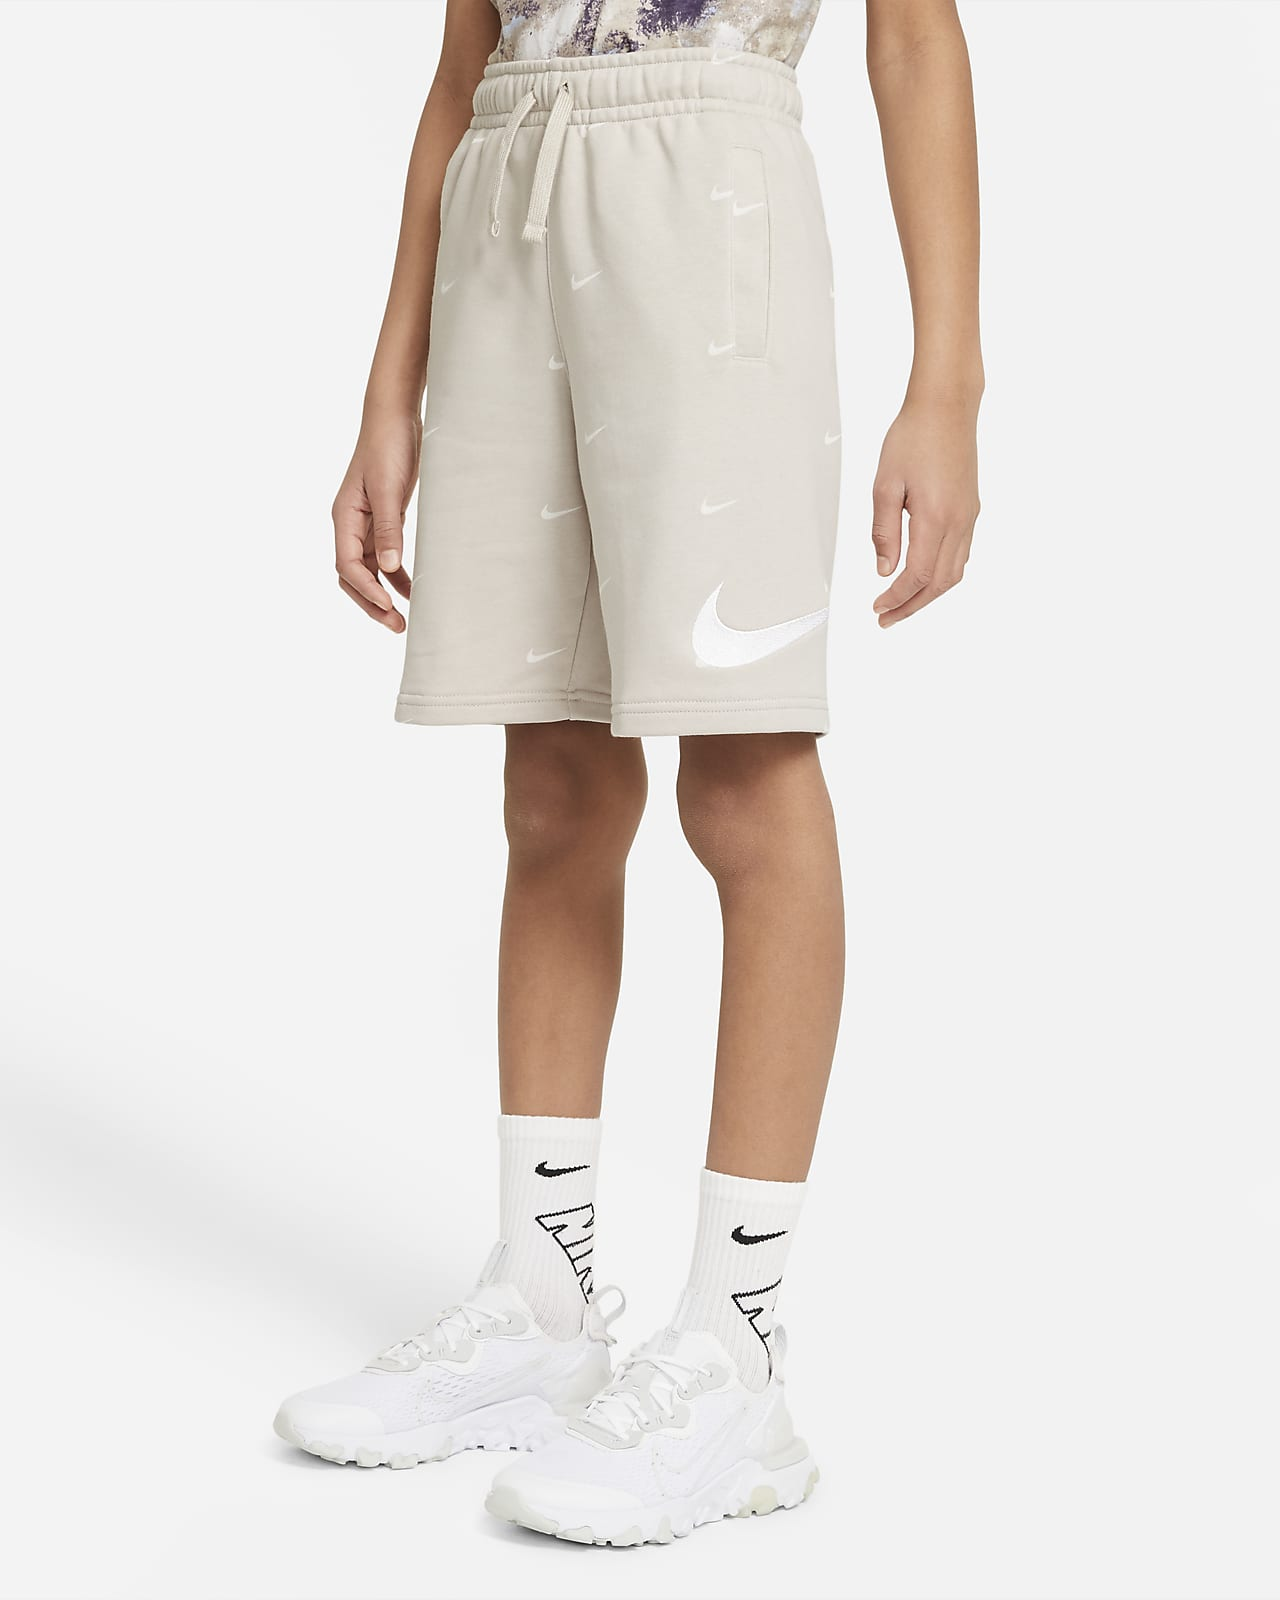 Nike Sportswear Swoosh Older Kids' (Boys') French Terry Shorts